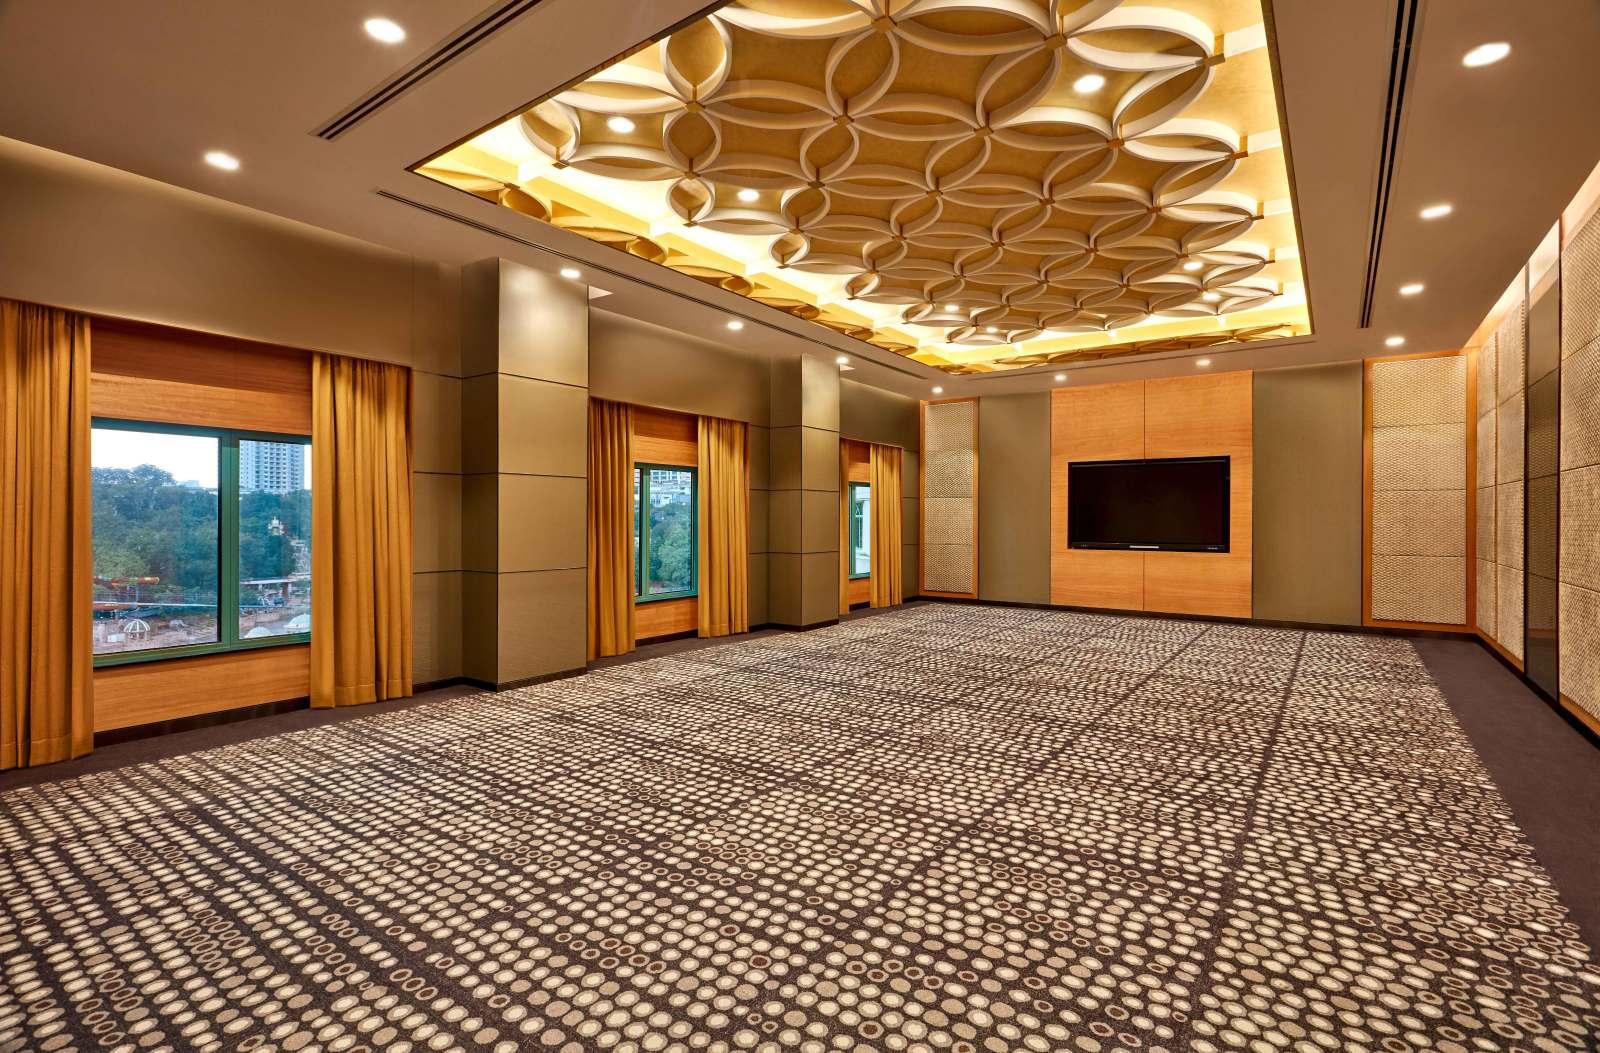 sunway resort hotel & spa function room